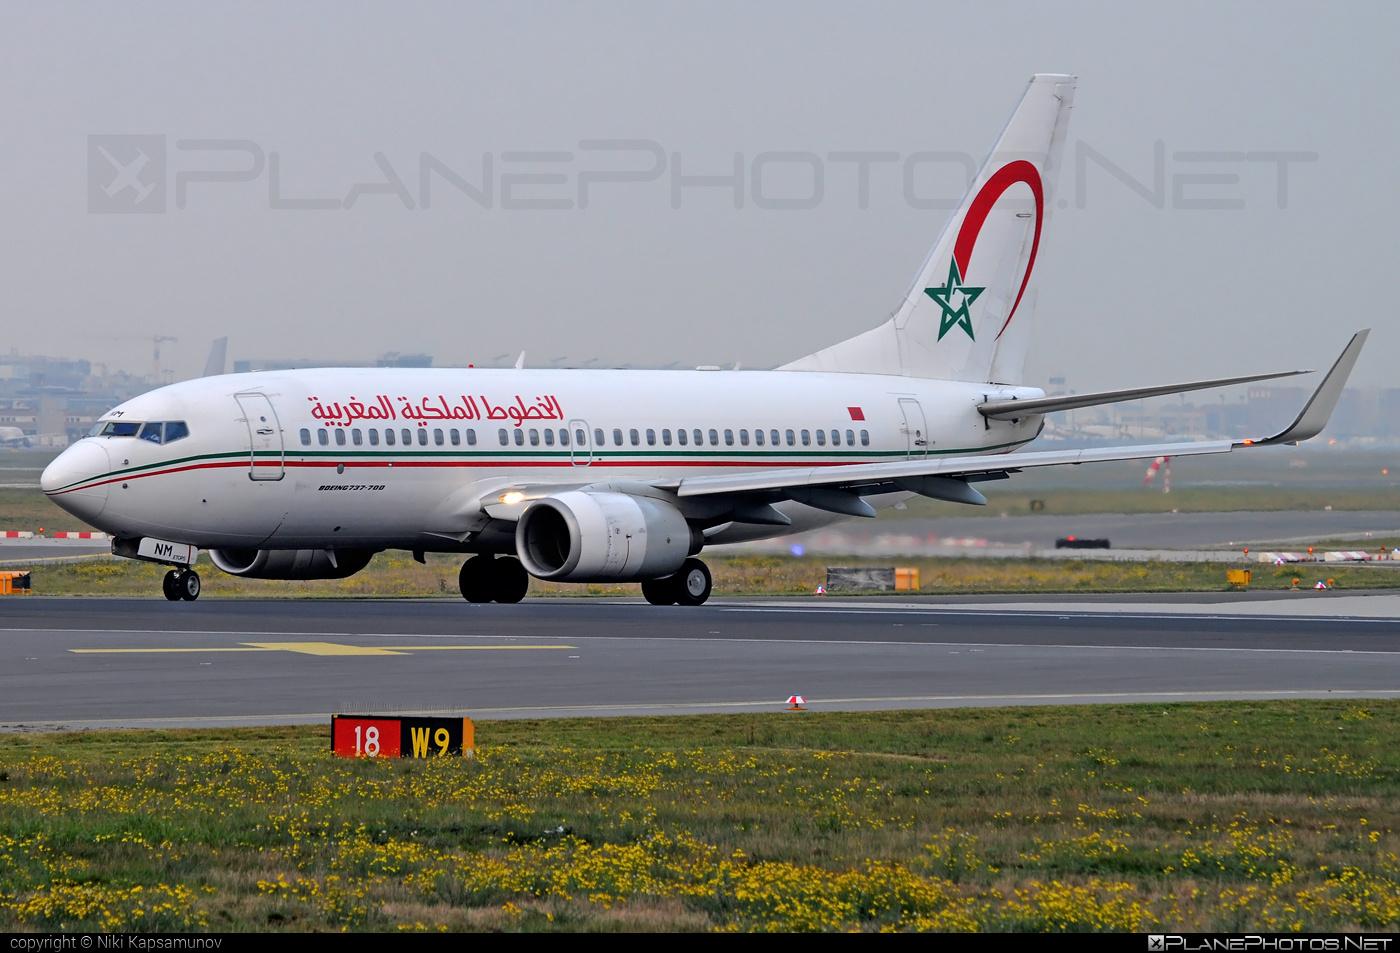 Boeing 737-700 - CN-RNM operated by Royal Air Maroc (RAM) #b737 #b737nextgen #b737ng #boeing #boeing737 #royalairmaroc